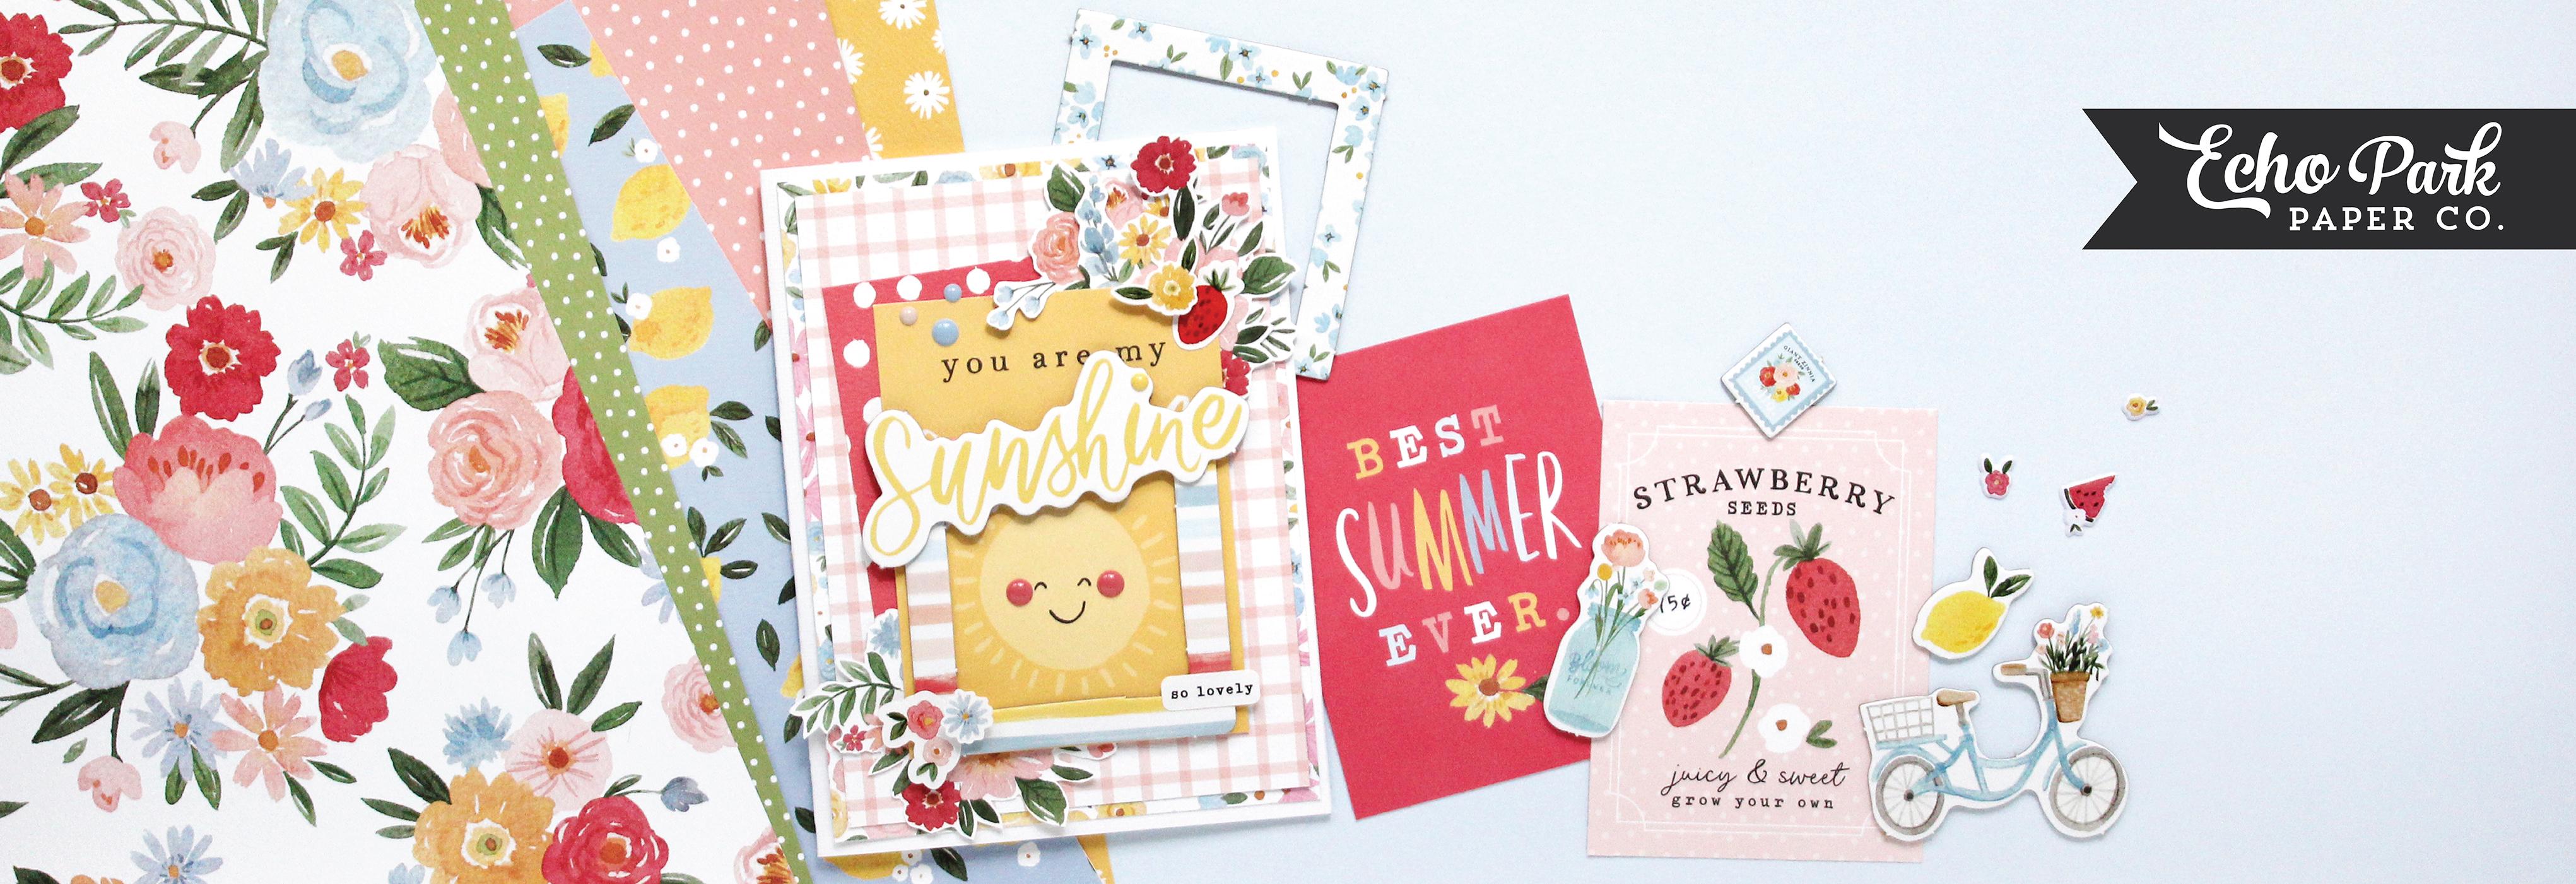 ep-summer-snap-click-banner-4083.jpg